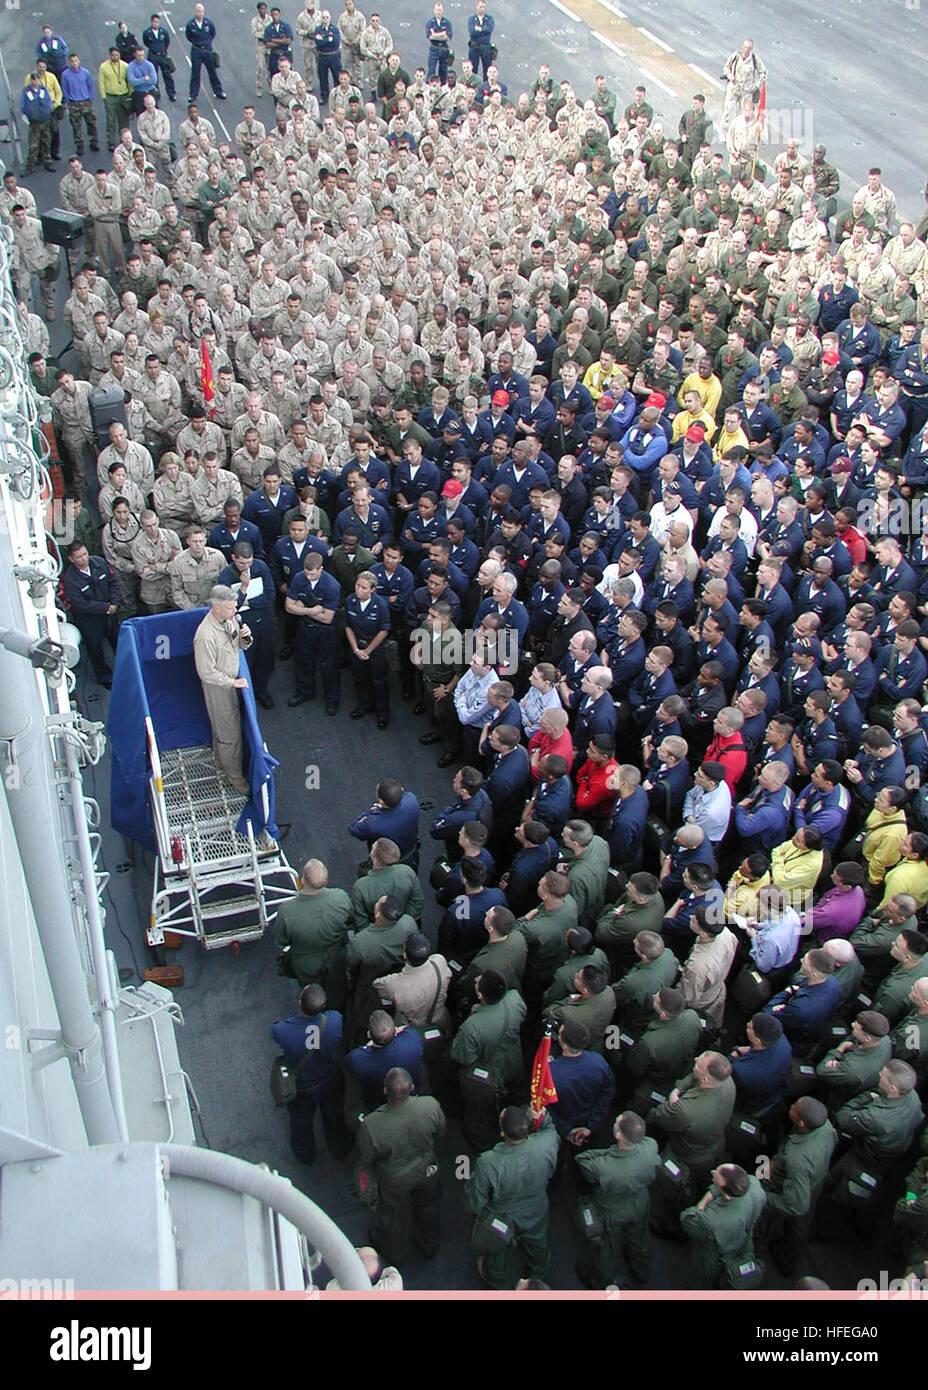 030305-N-6197C-002 Arabian Sea (Mar. 5, 2003) -- Maj. Gen. James F. Amos addresses the Sailors and Marines of USS Stock Photo